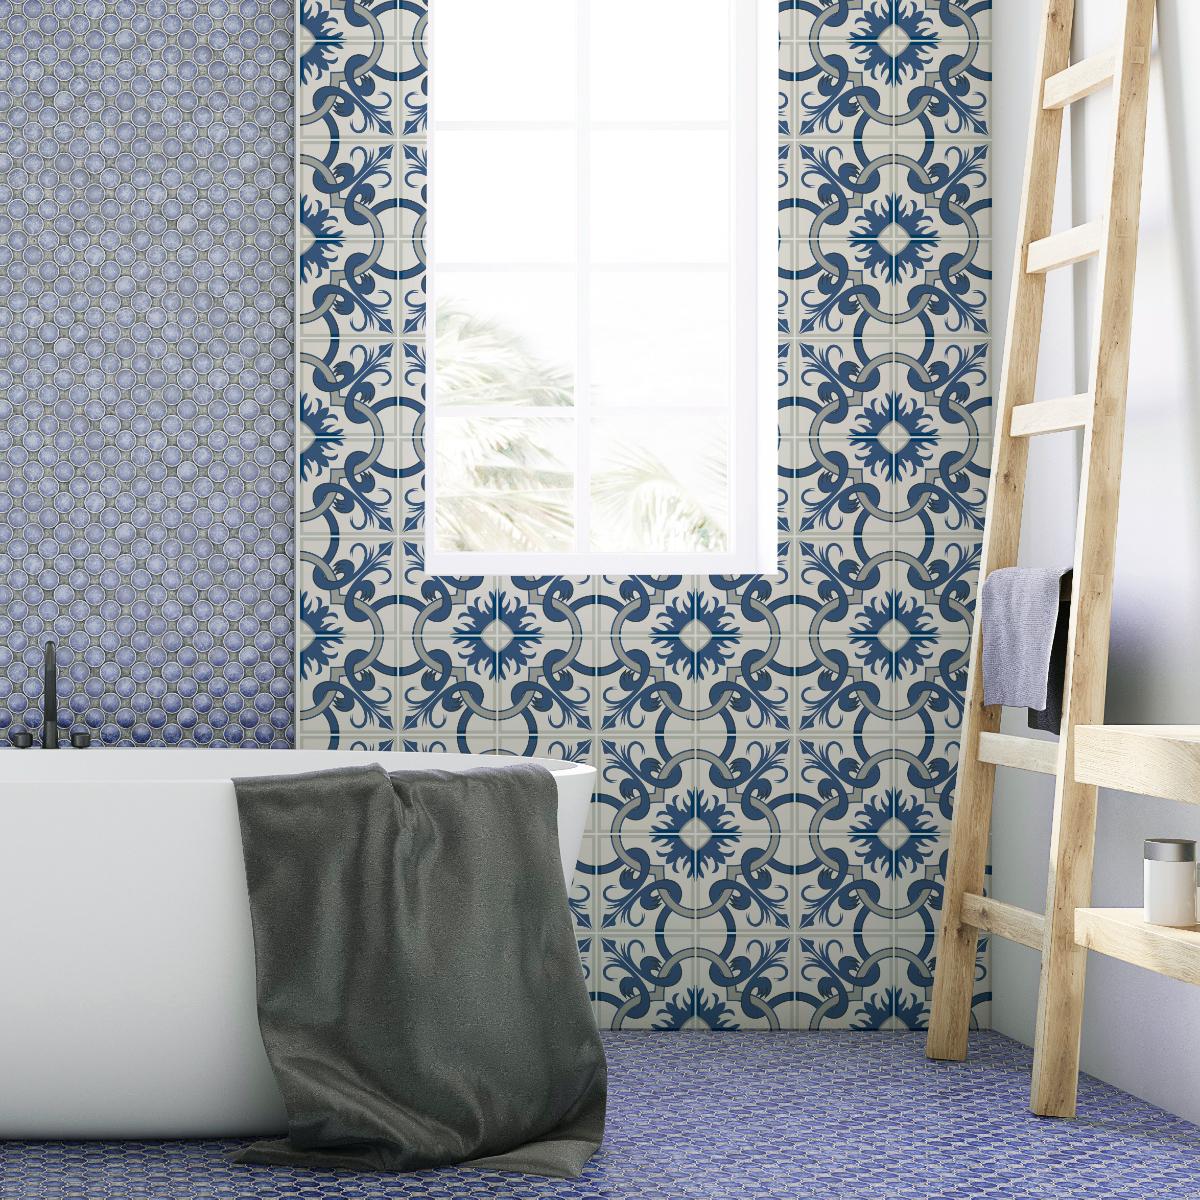 24 stickers carrelages azulejos porzia salle de bain et wc salle de bain ambiance sticker. Black Bedroom Furniture Sets. Home Design Ideas